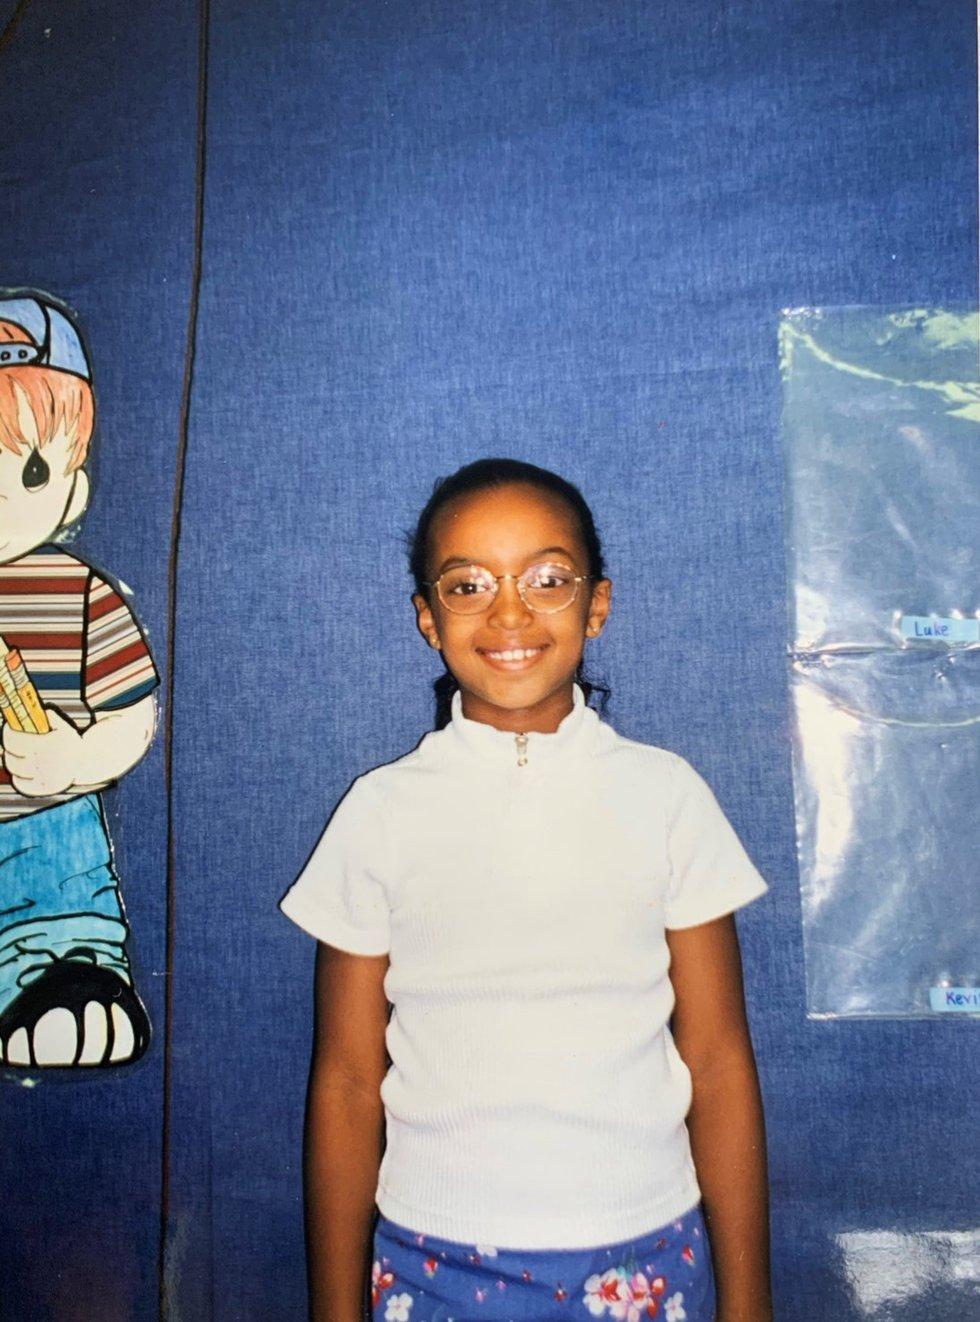 Abby Theodros ready for a new school year!